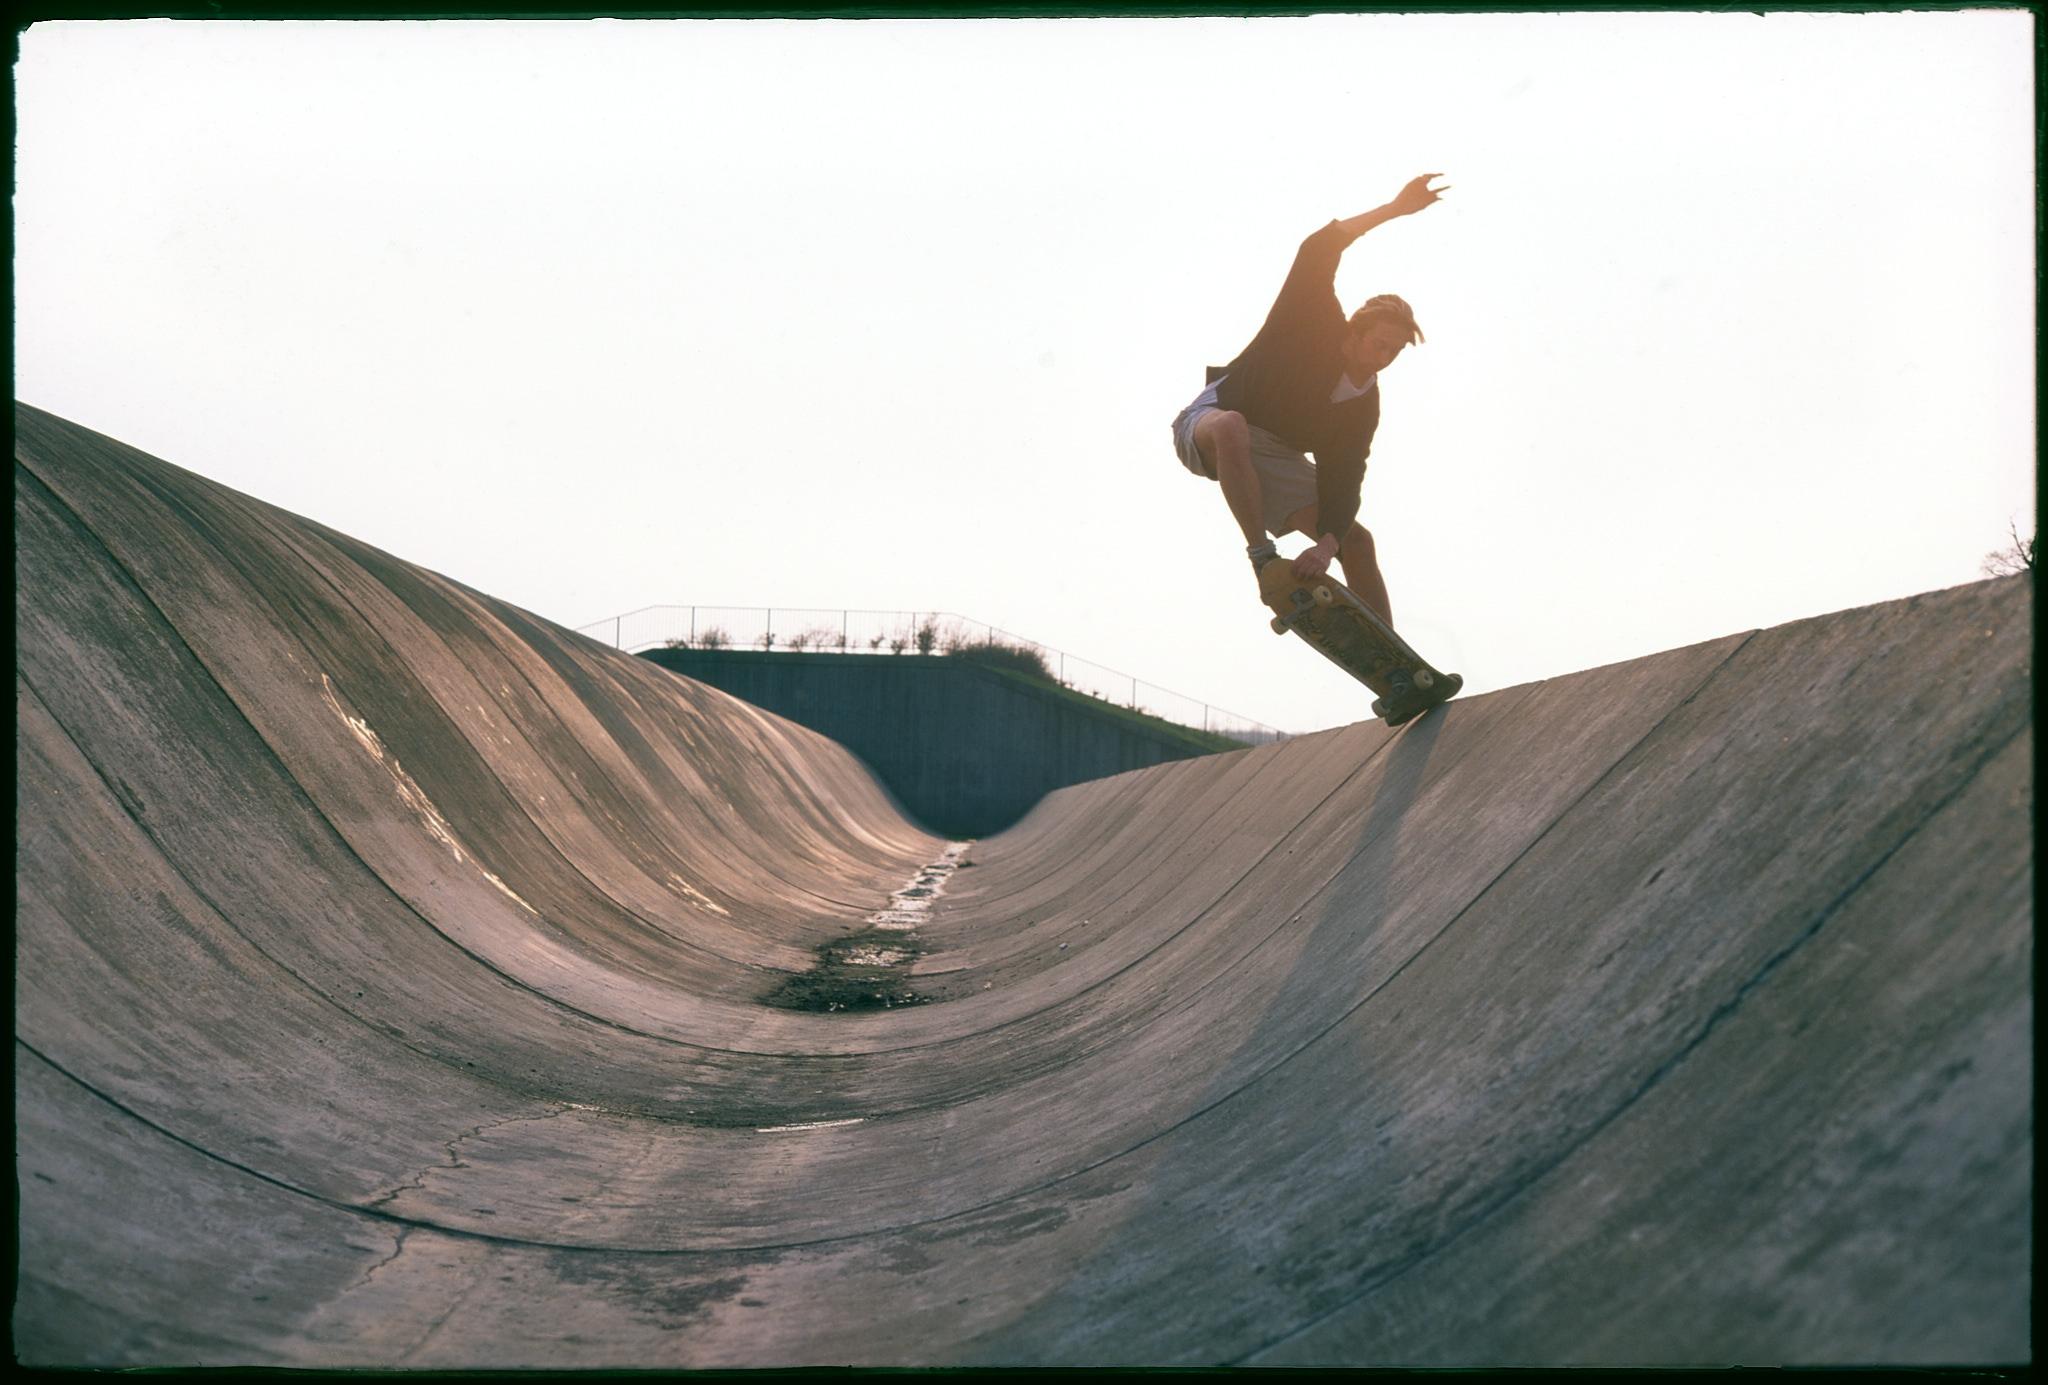 Phil Chapman, tailblock, Caldecotte Ditch, Milton Keynes, 1989. photo: Wig Worland